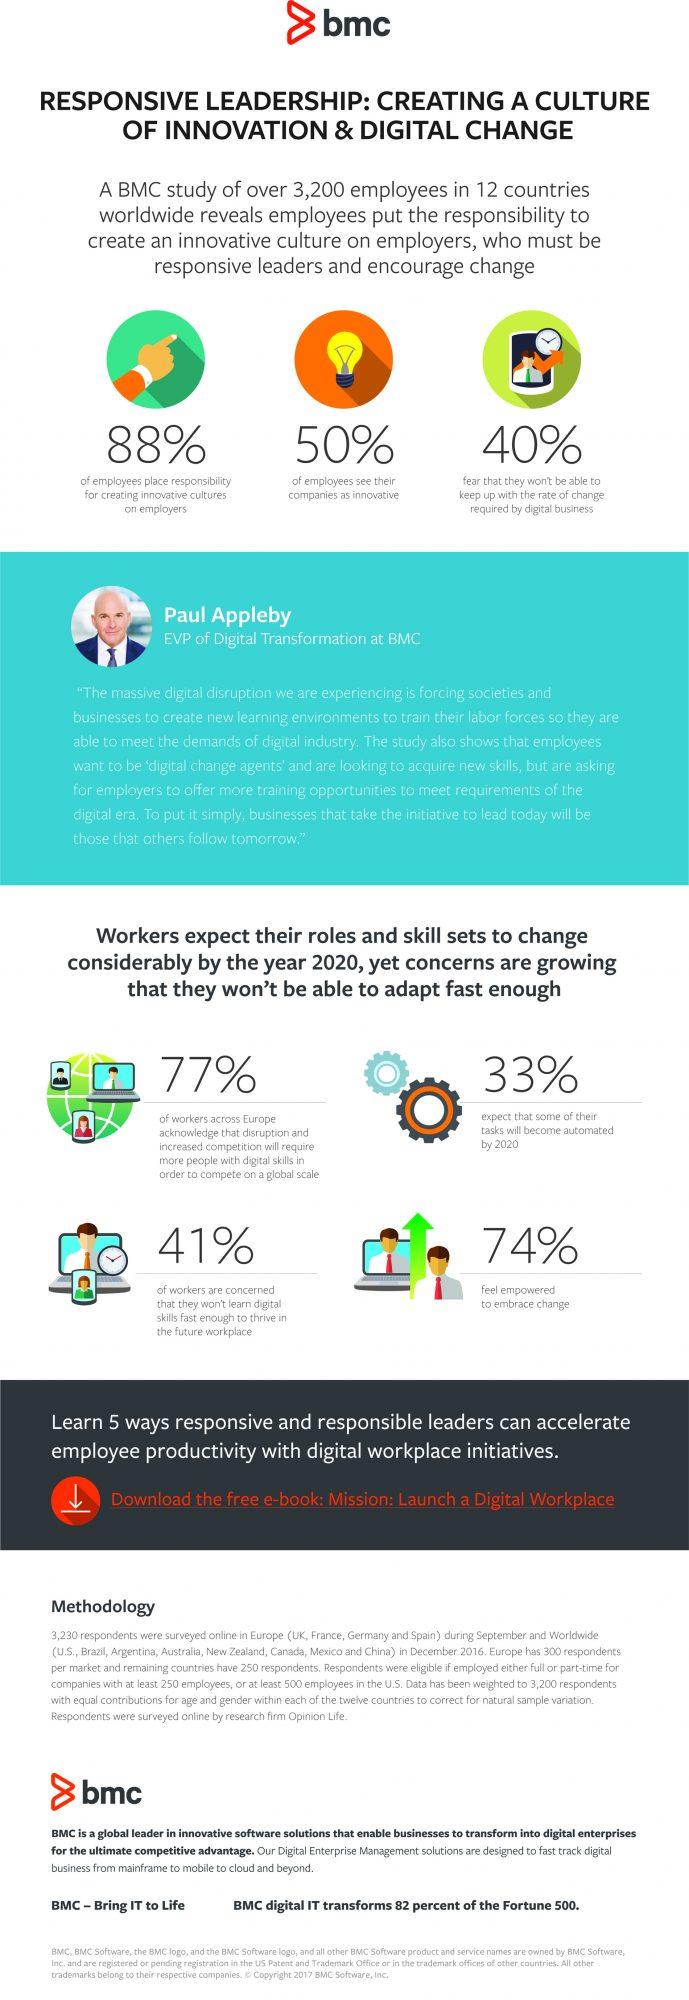 BMC_Digital-Change-Agents-Infographic_FINAL_18JAN2017.jpg